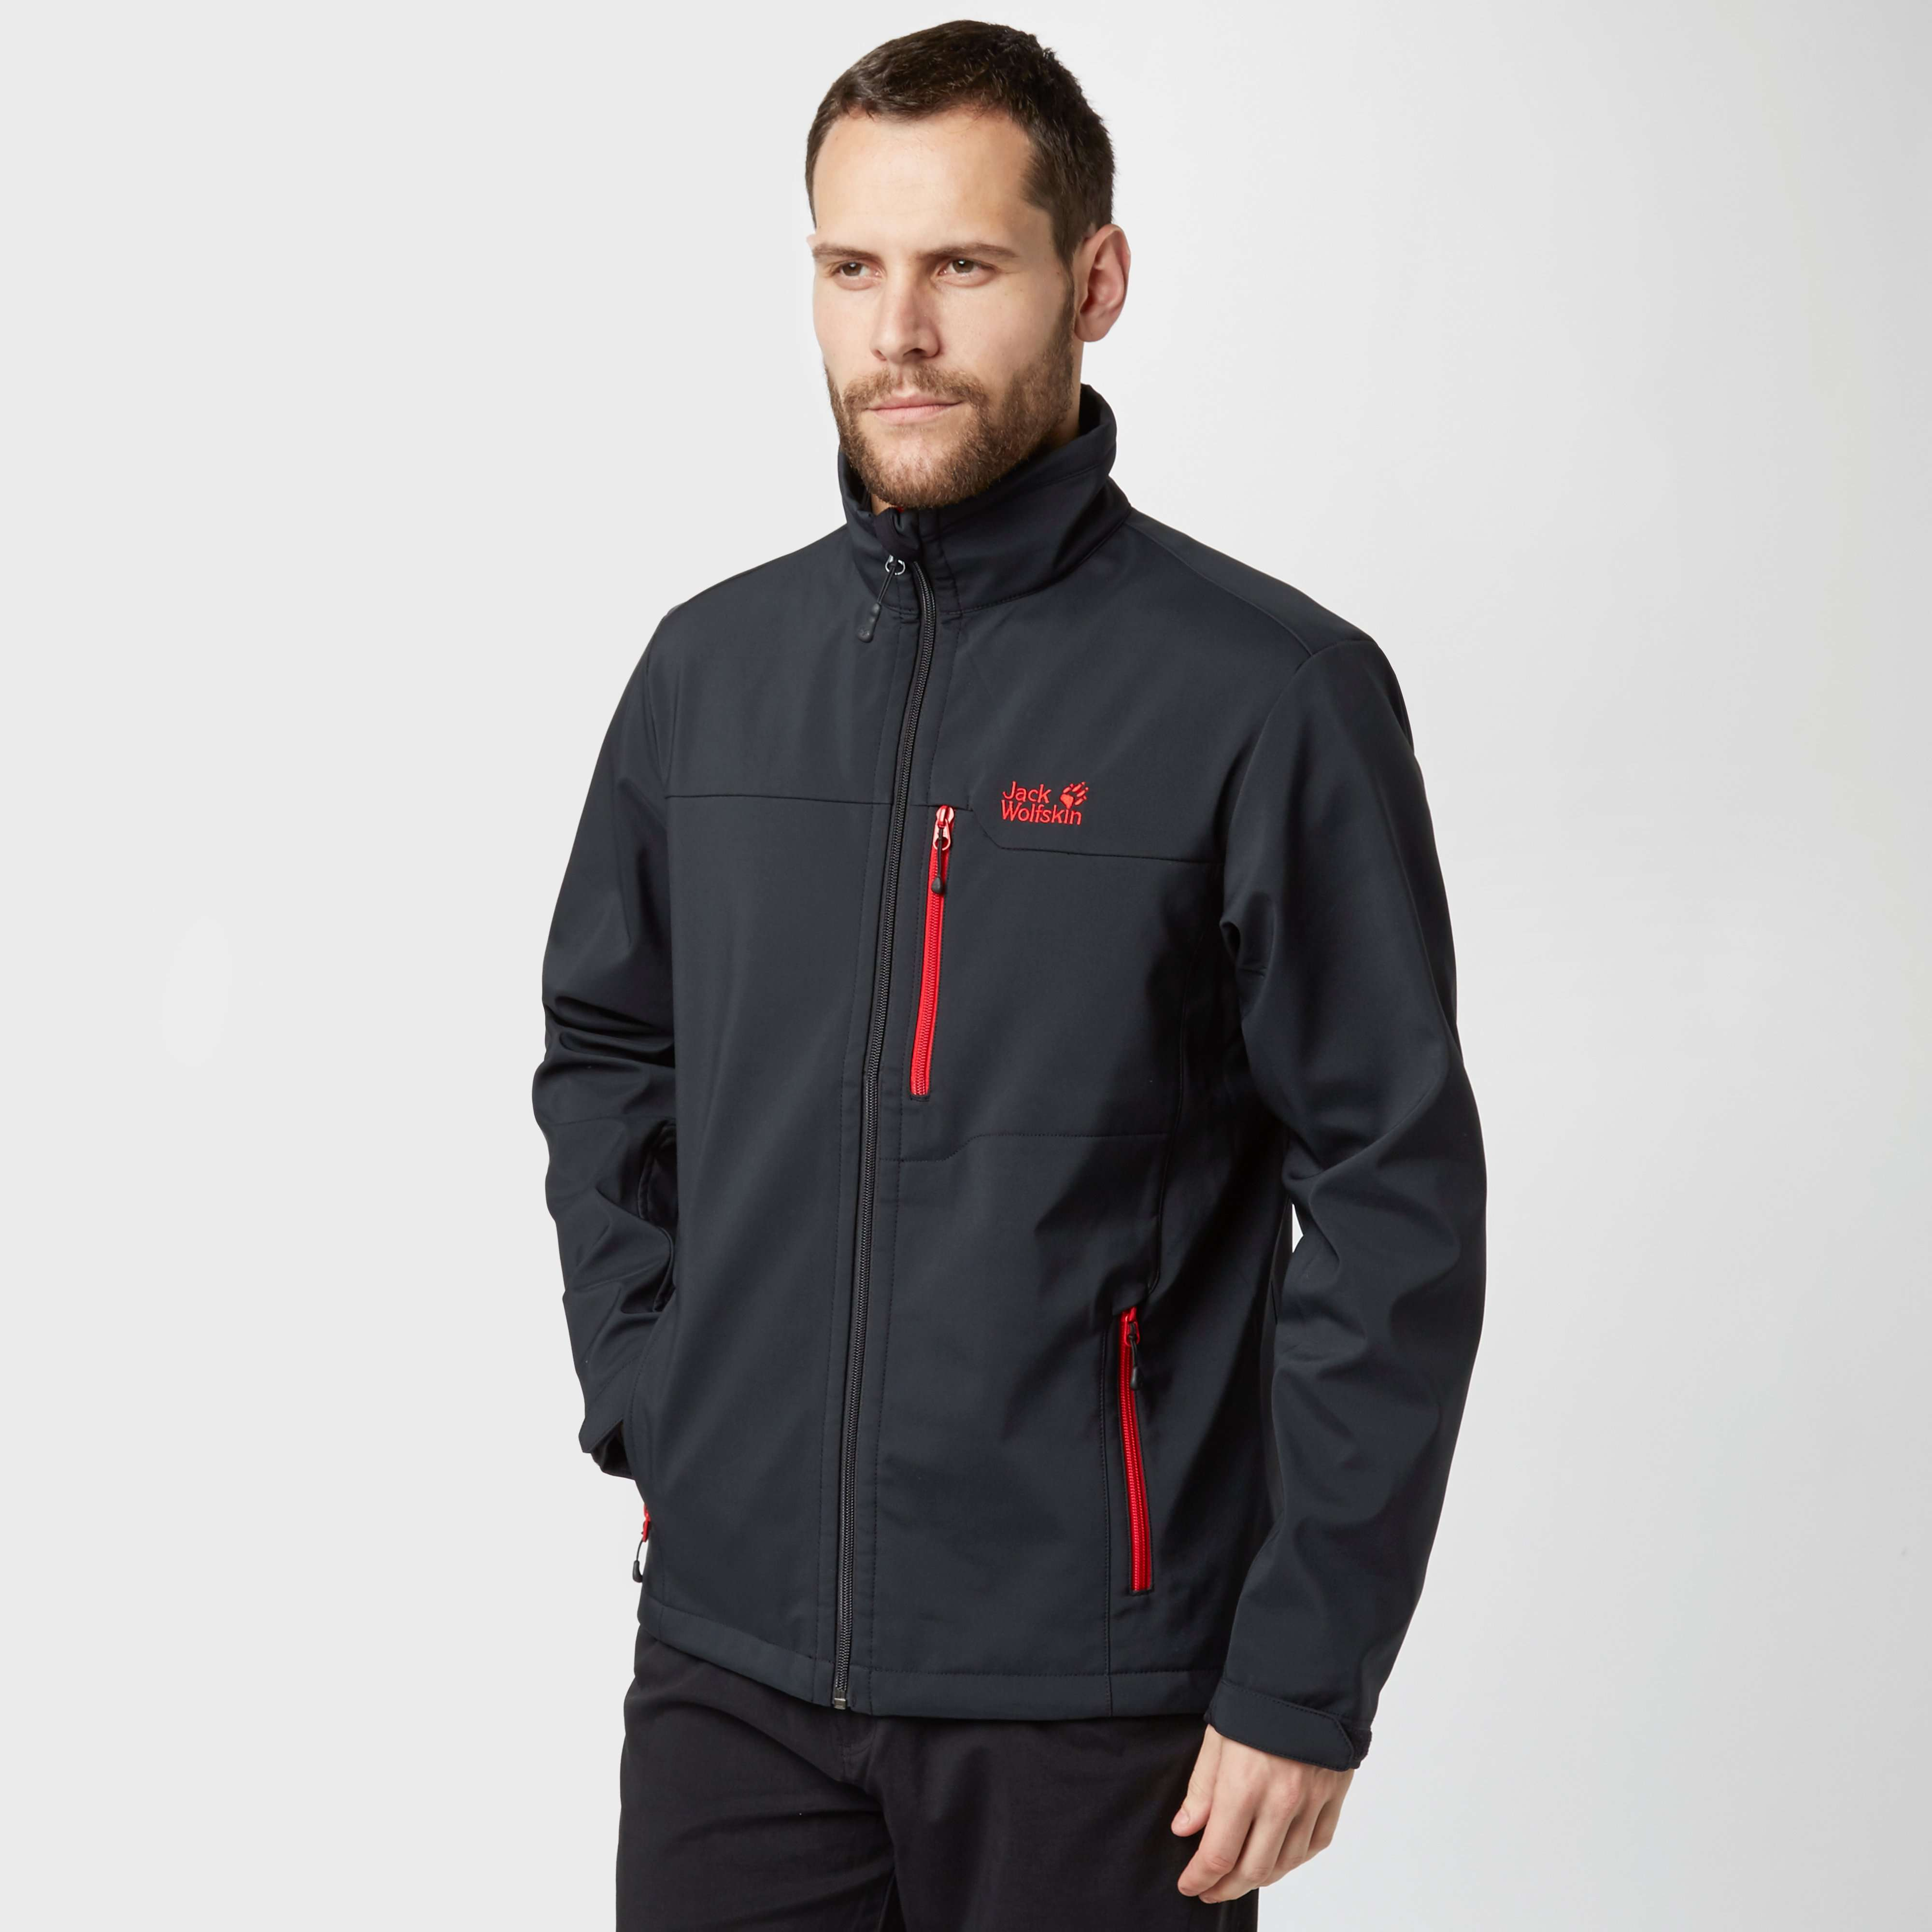 JACK WOLFSKIN Men's Torngat Softshell Jacket